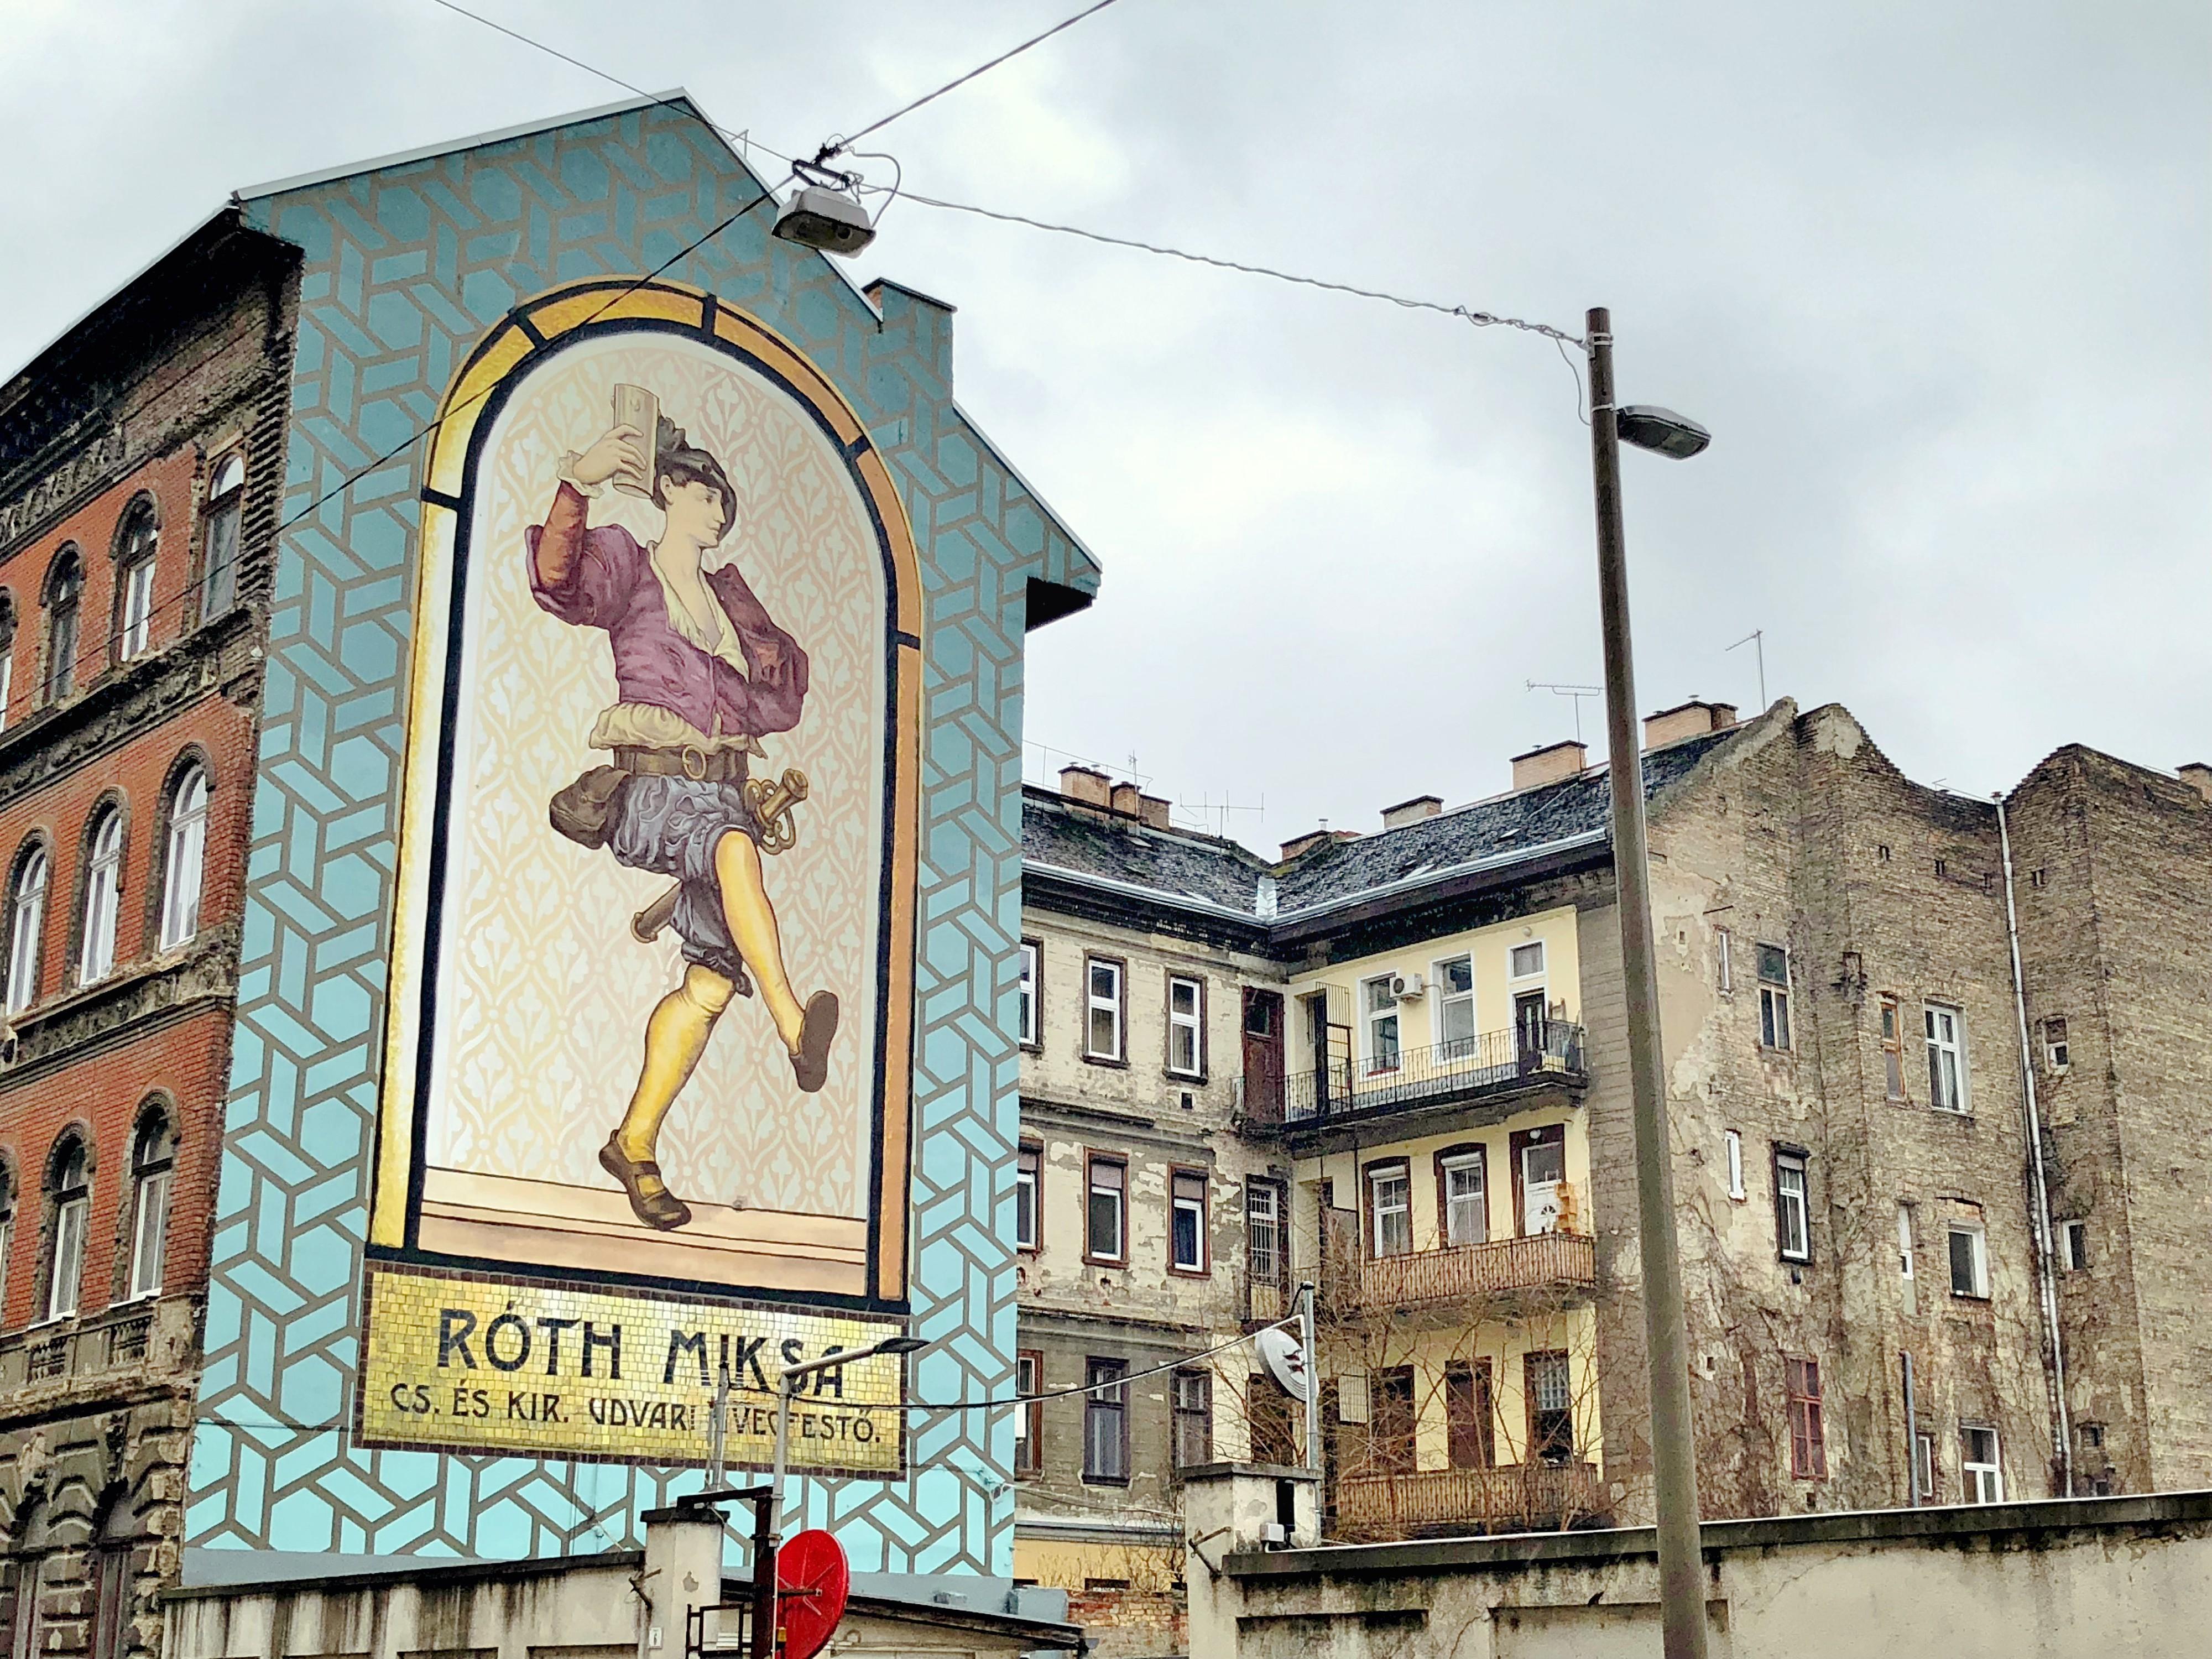 Que-ver-en-budapest-blog-de-moda-fashion-travel-ChicAdicta-influencer-viajes-Chic-Adicta-PiensaenChic-Piensaen-Chic